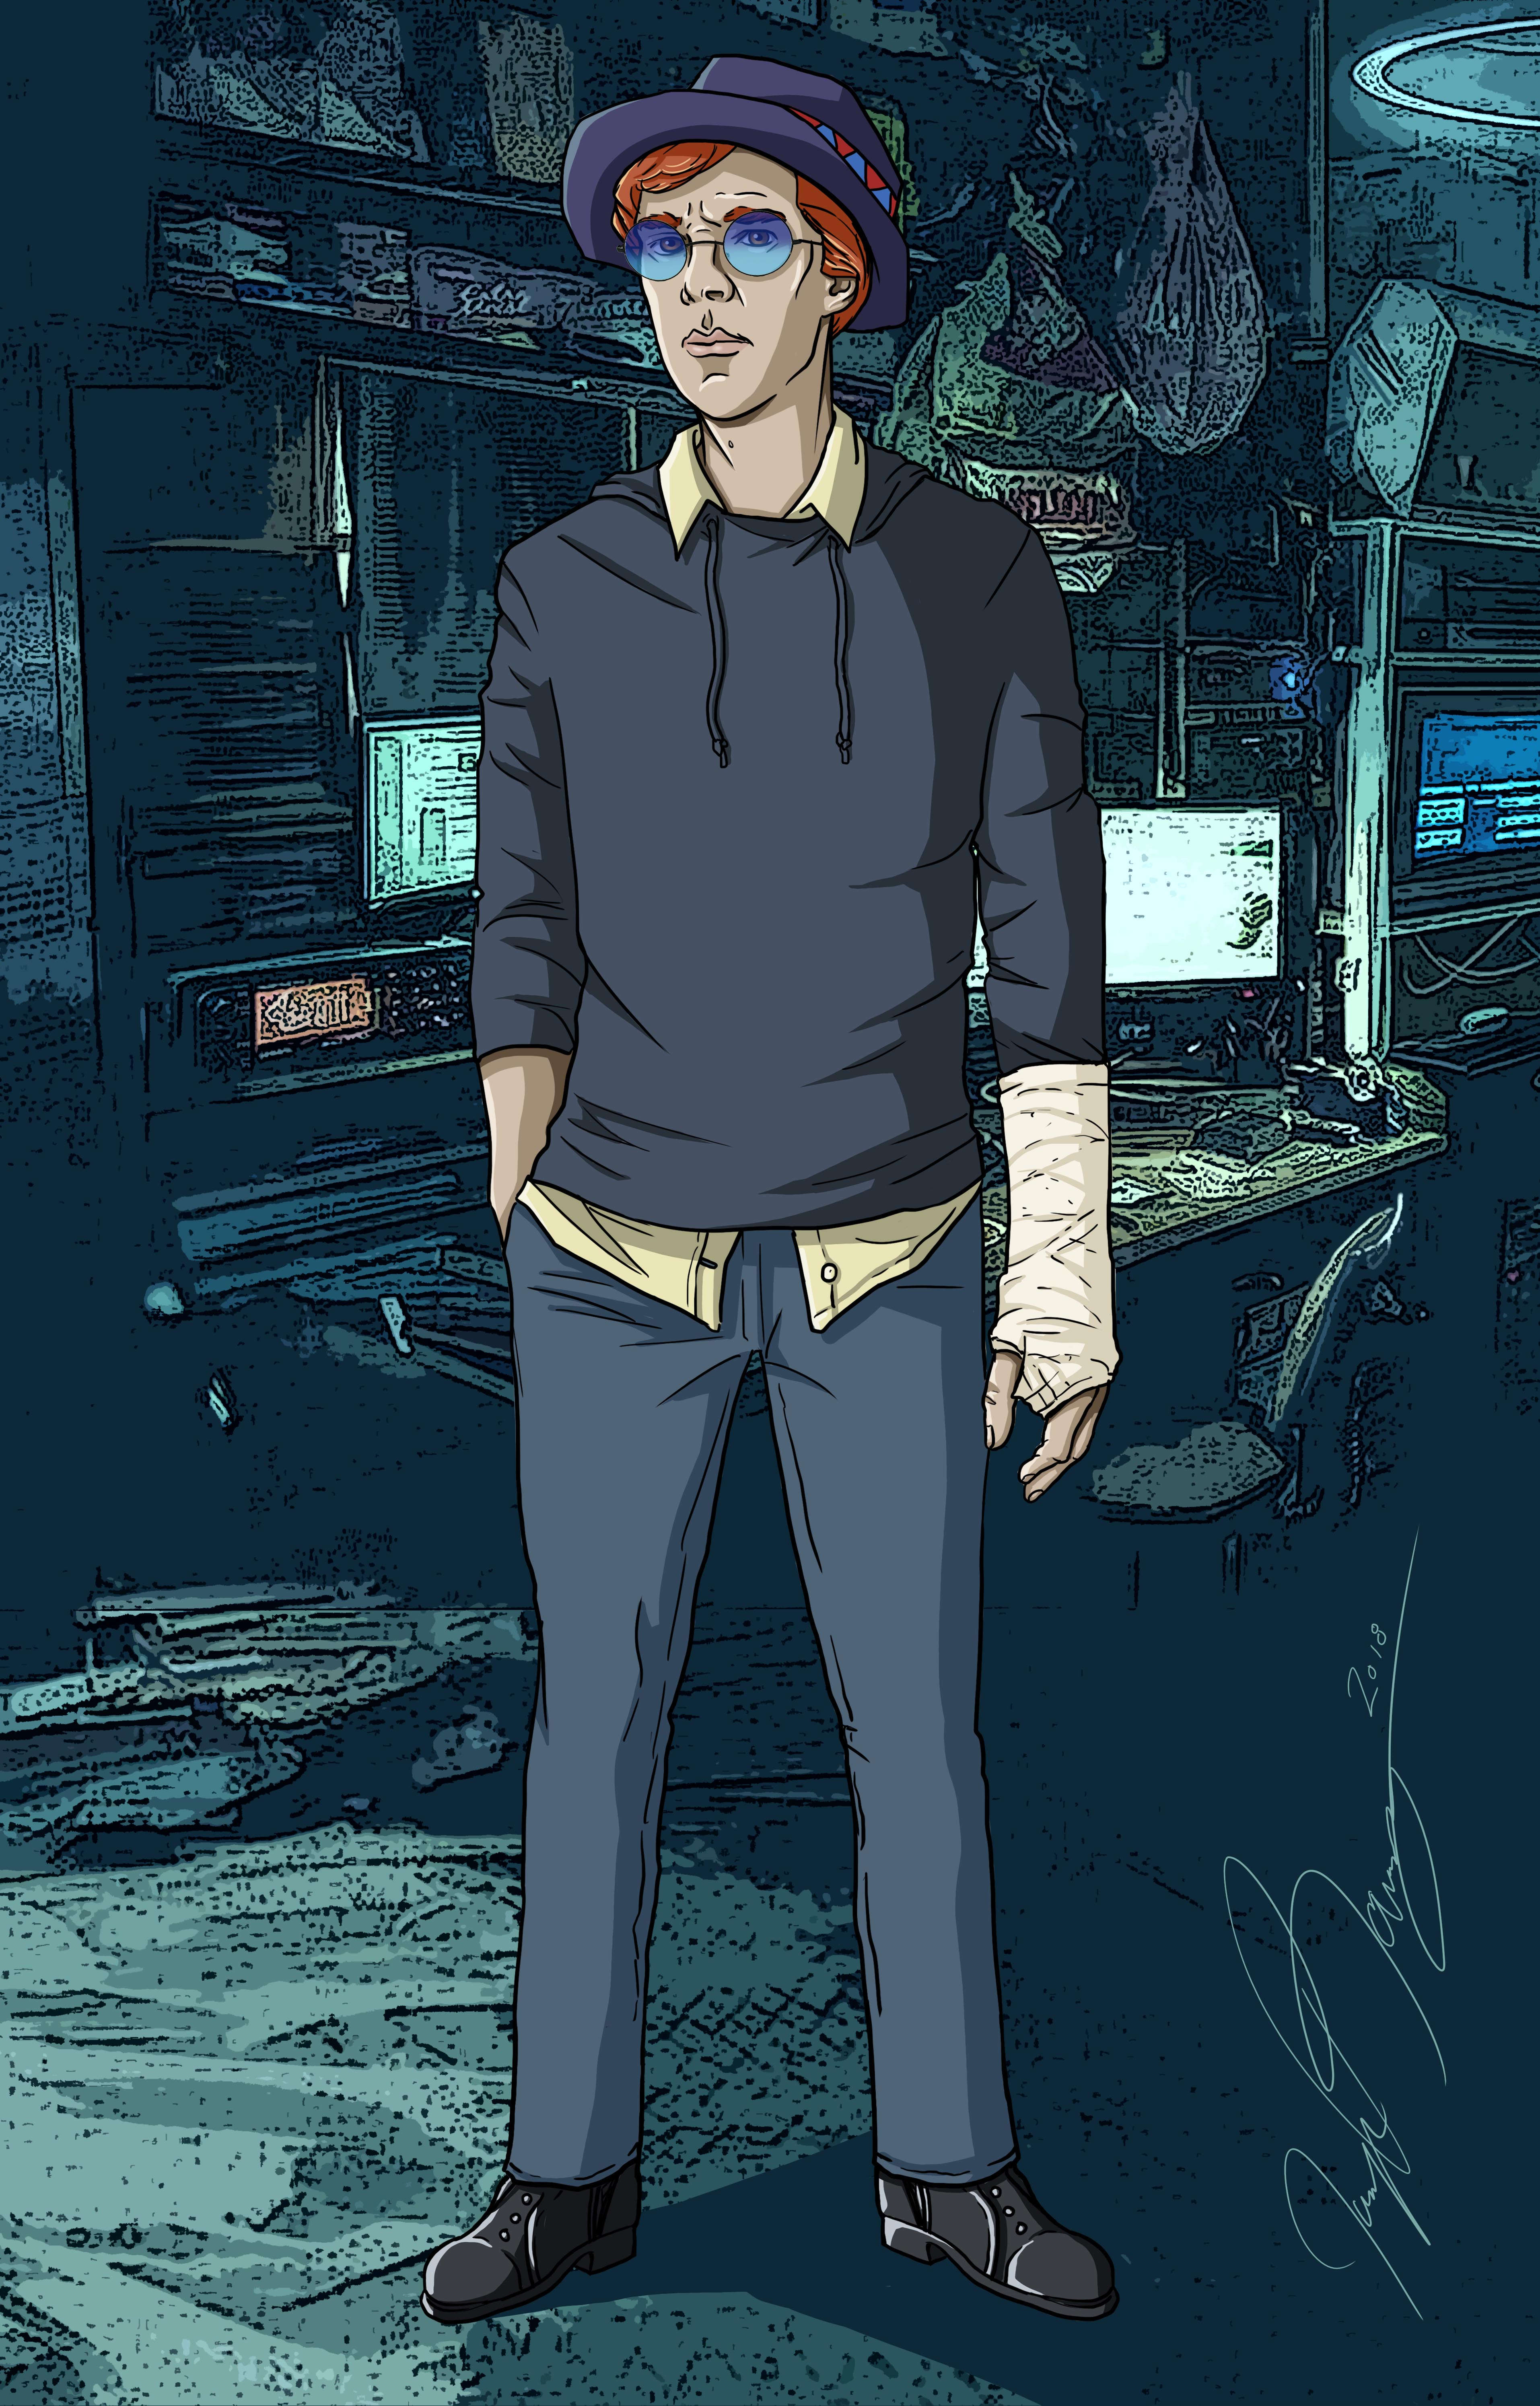 Undercover Sherlock - Will